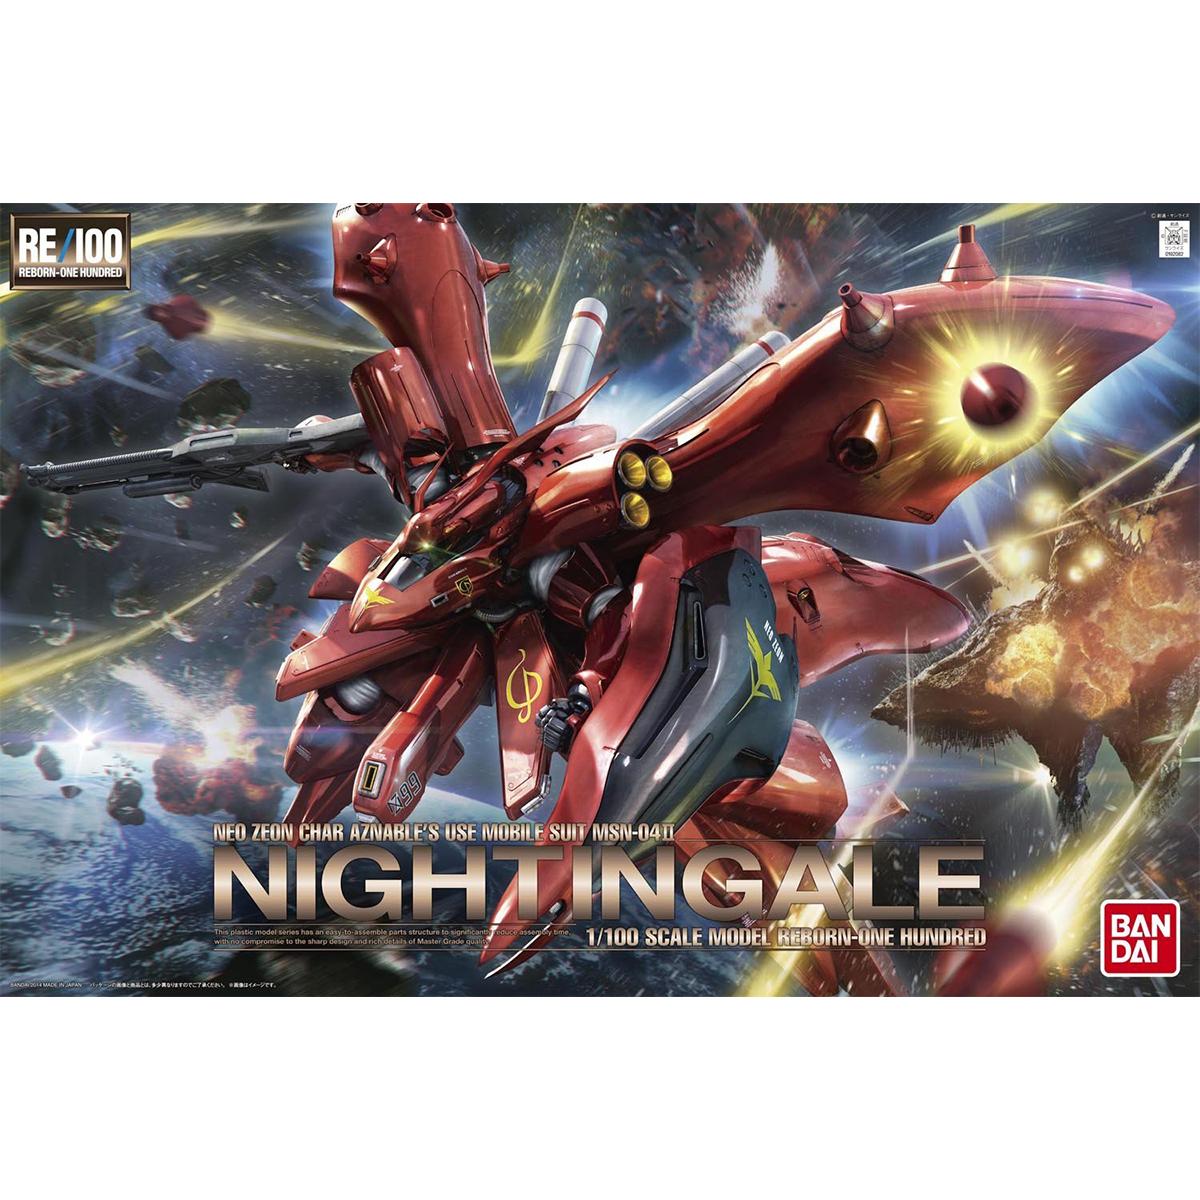 RE/100 MSN-04II Nightingale